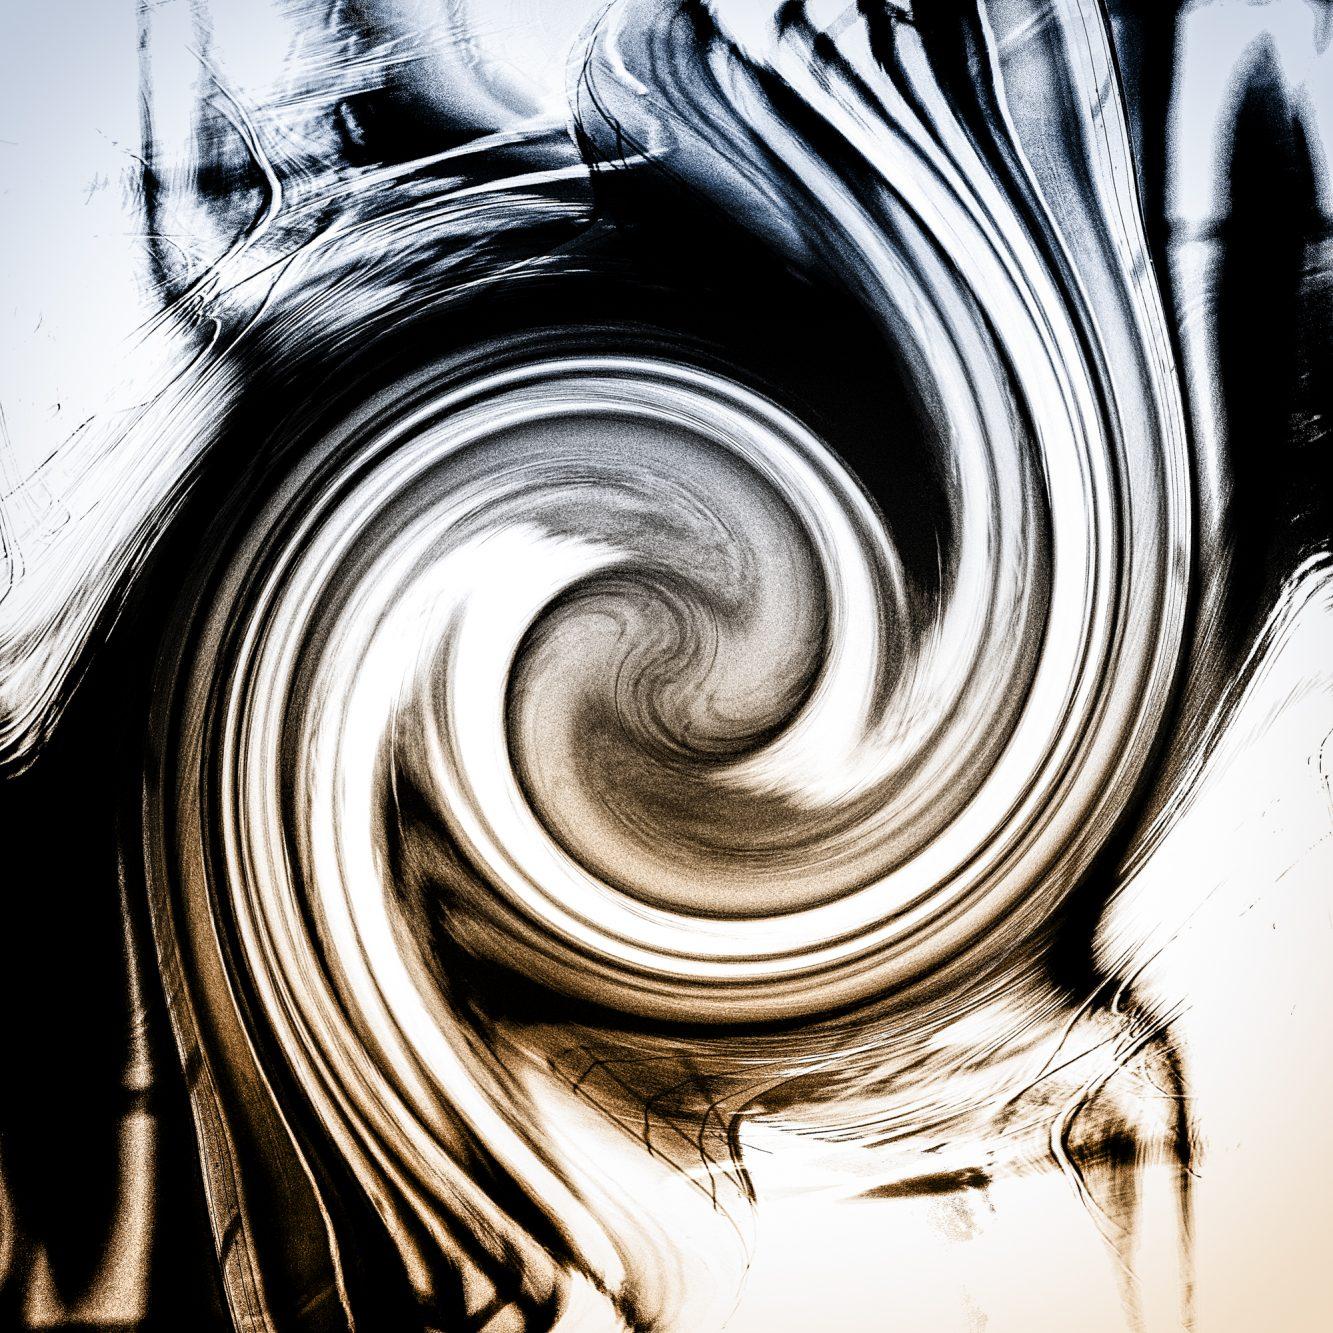 glass-photo-art-5775-bewerkt